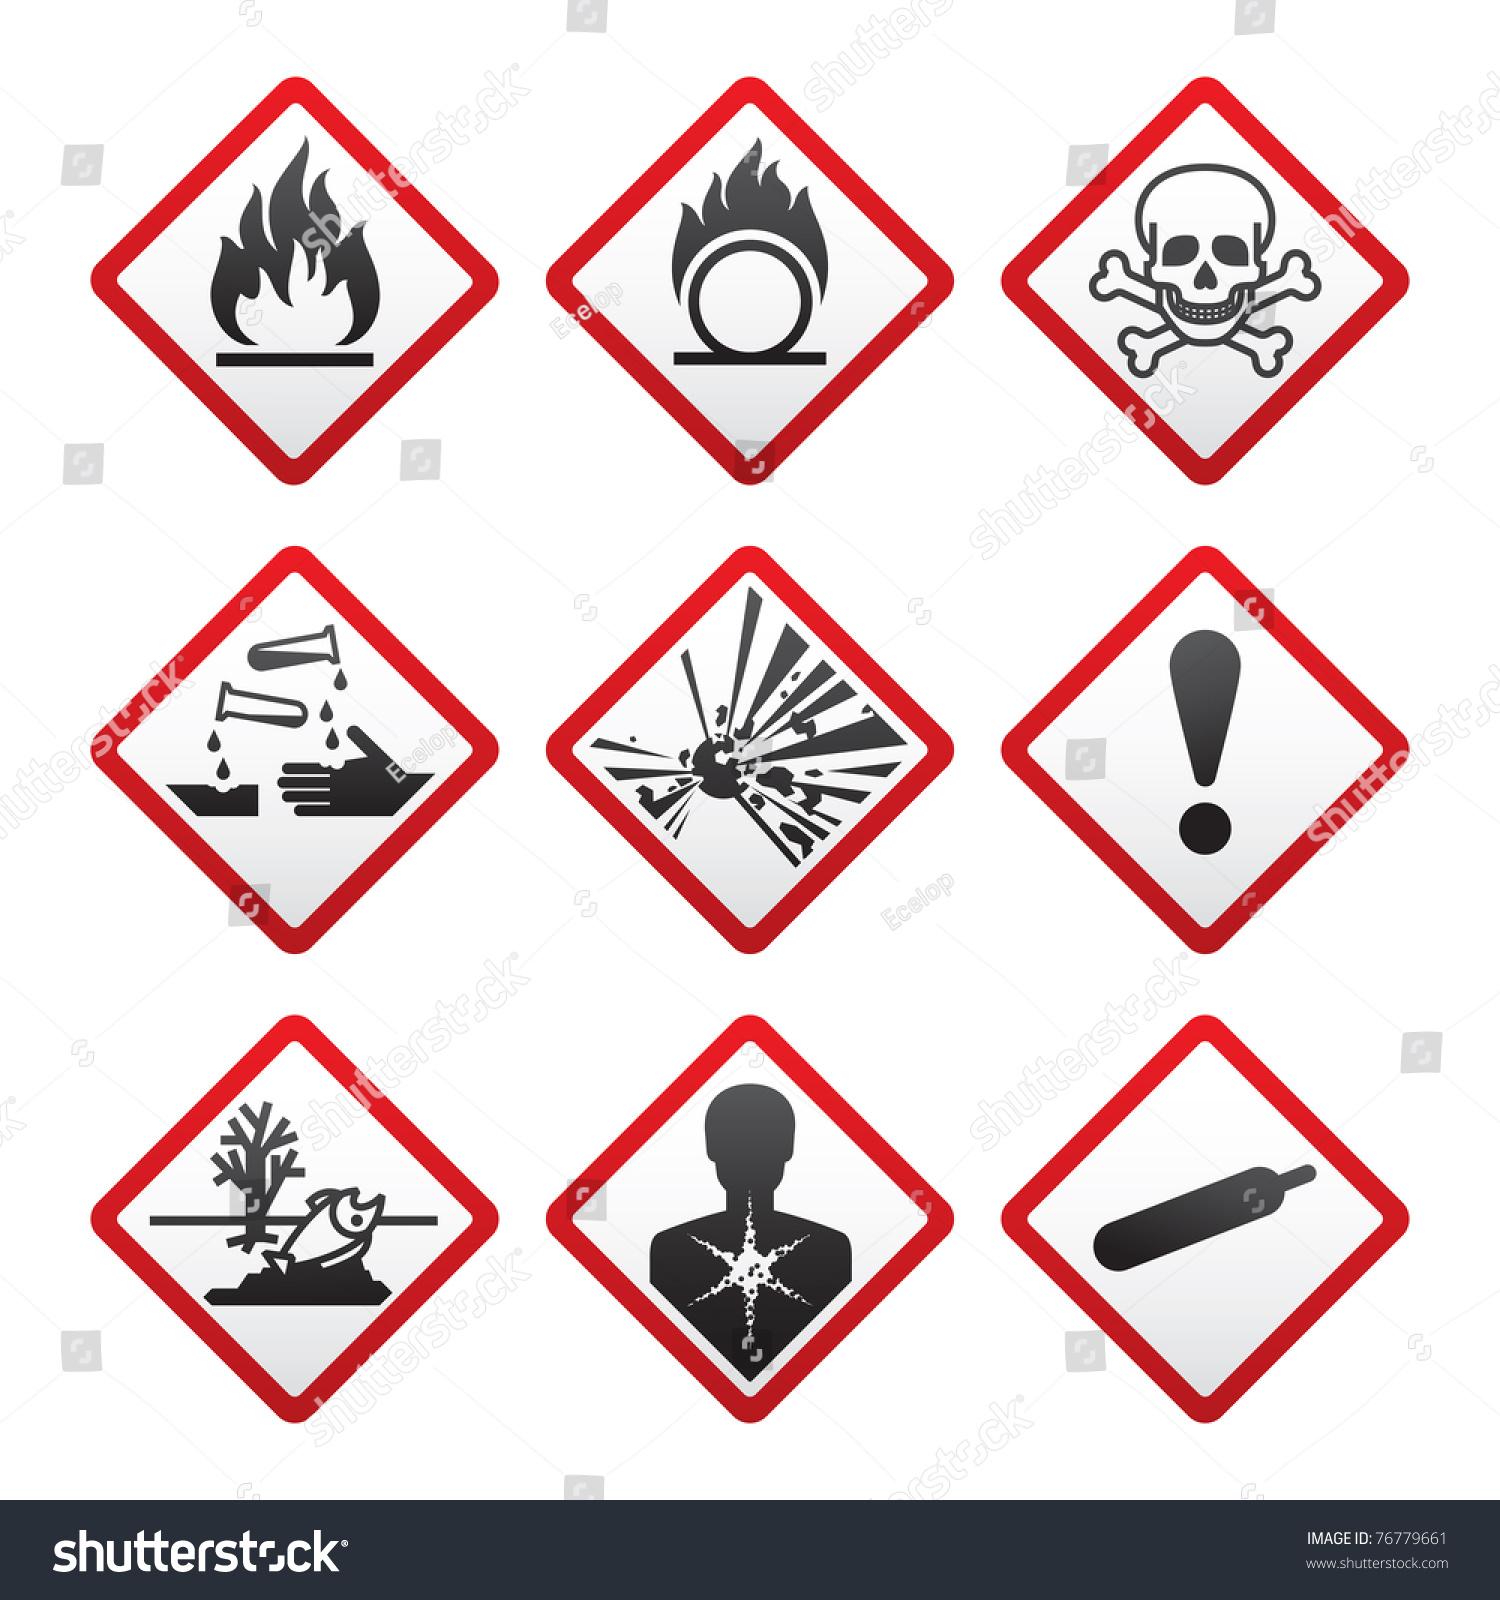 Outdoor Safety Symbols